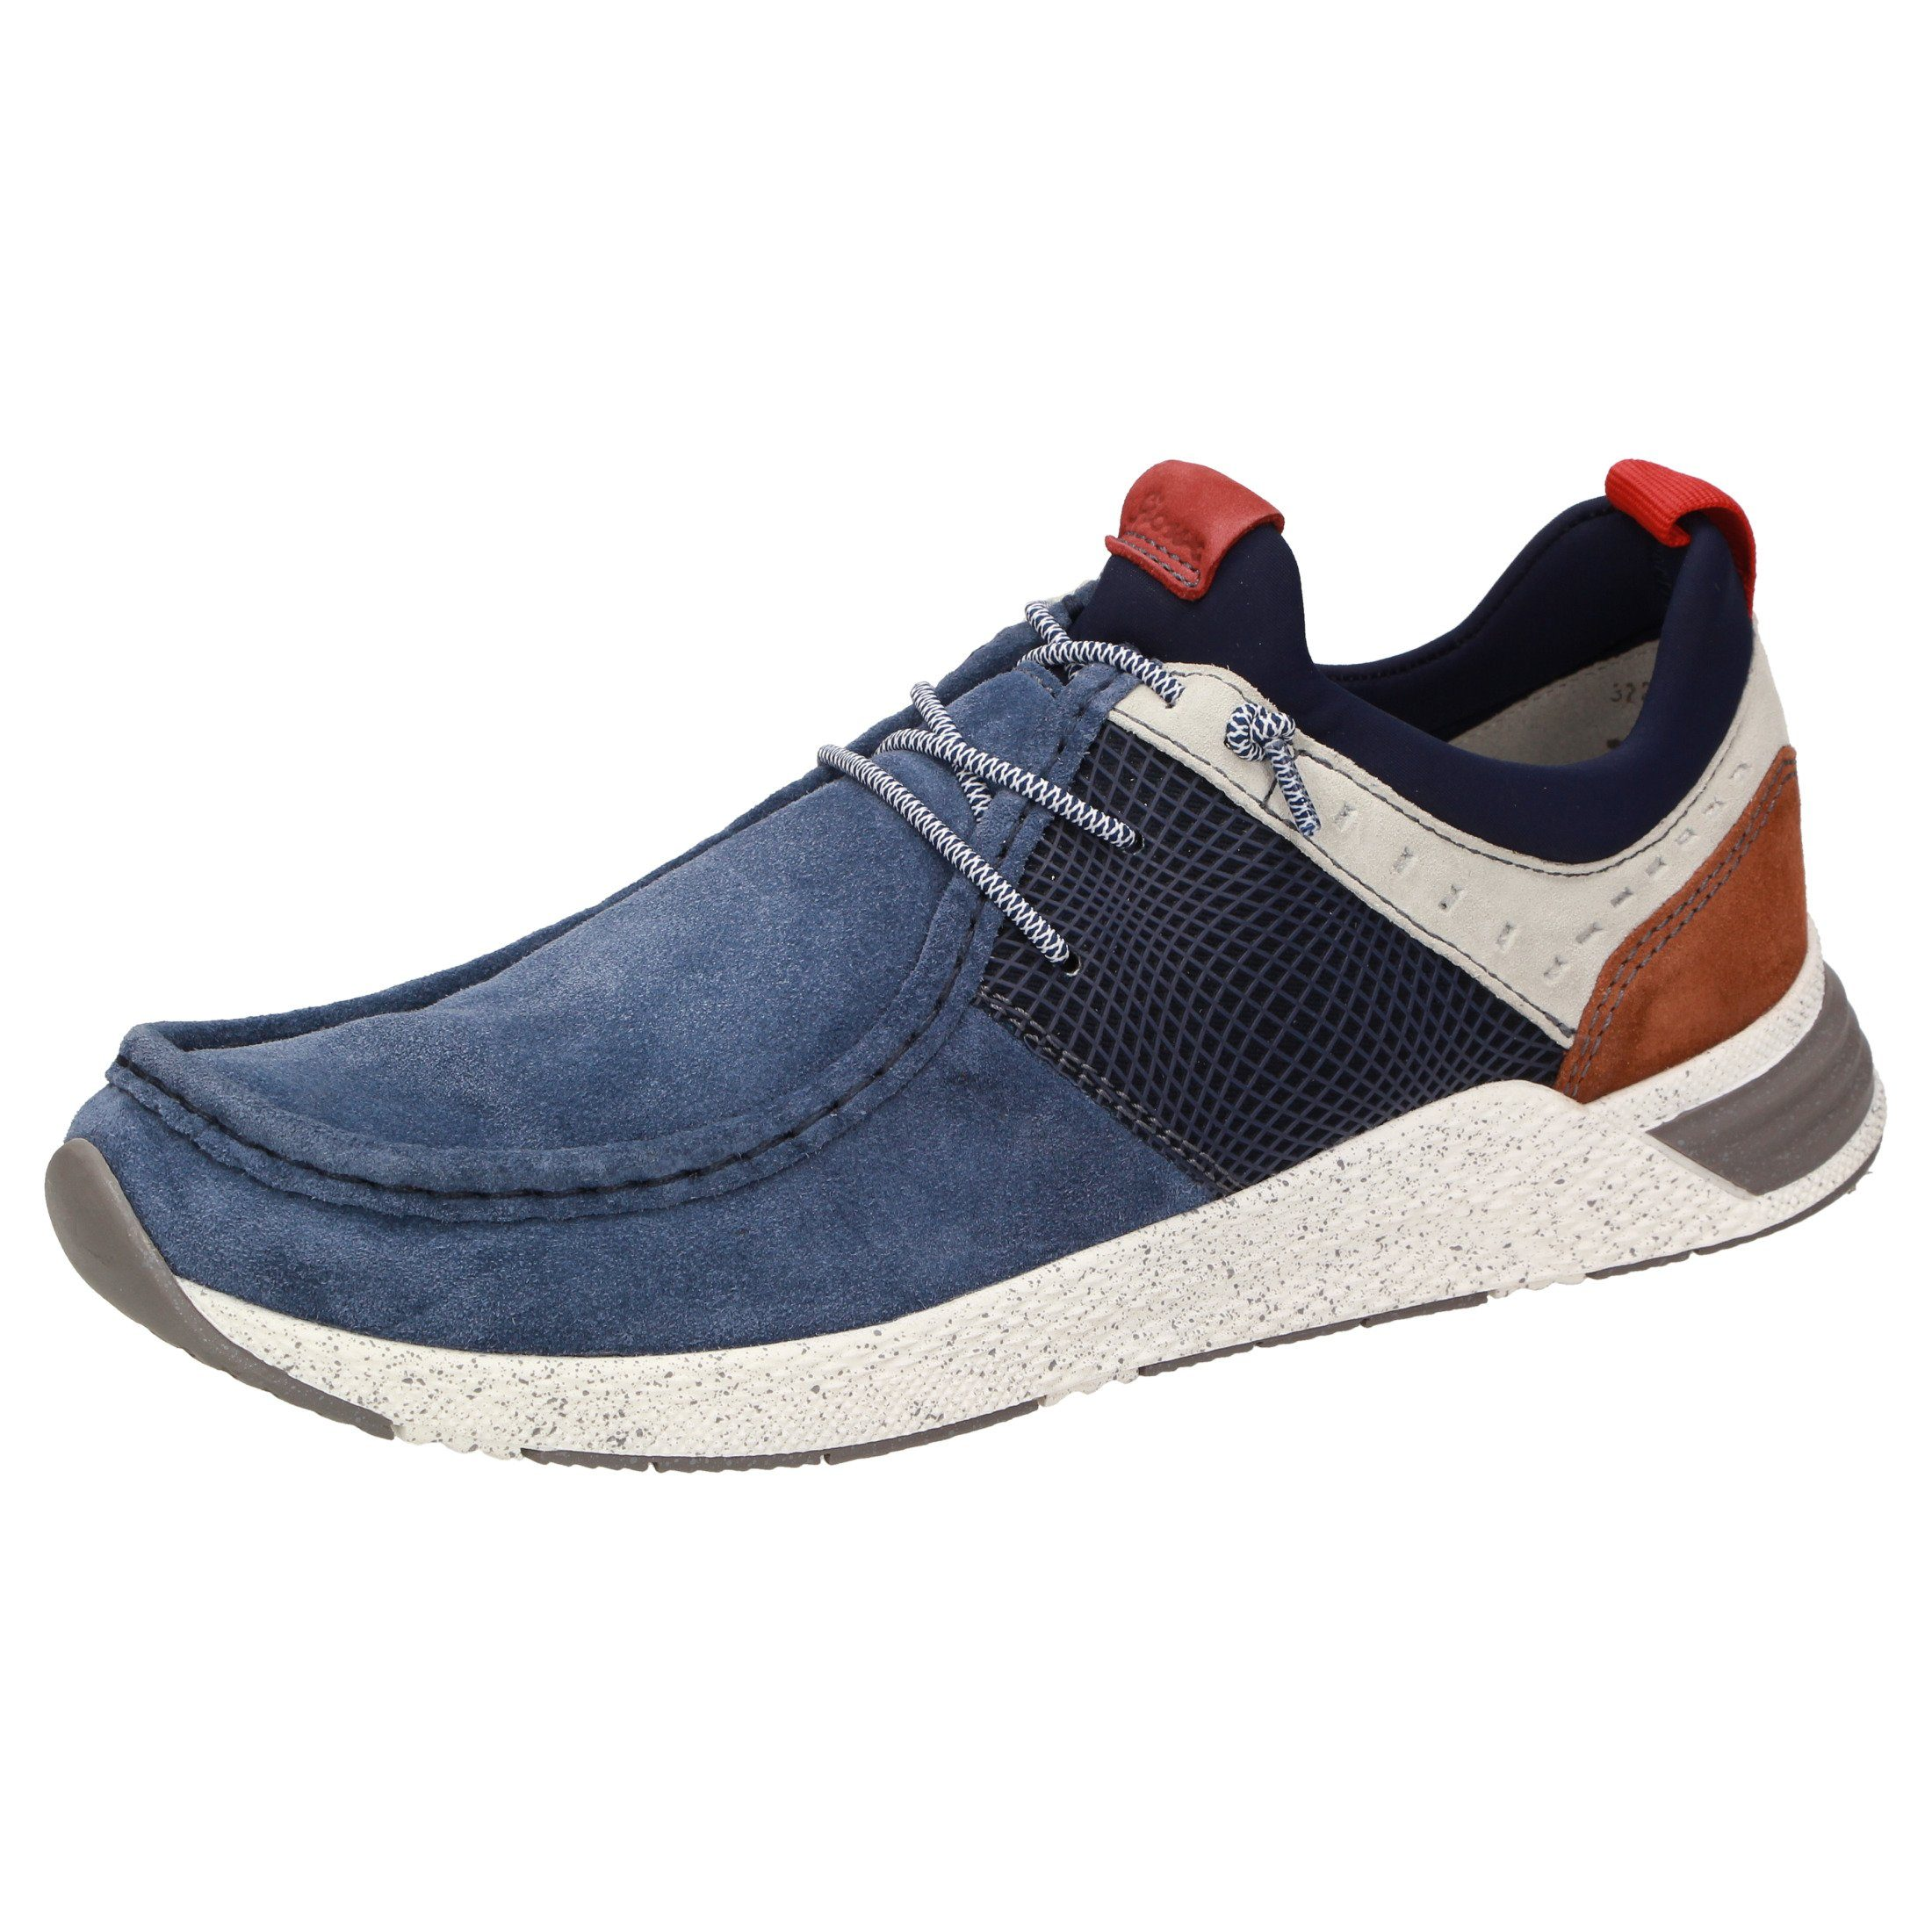 20cm To 130cm Schuhe Turnschuhe Metall Endstücke Orange Specks Blau W